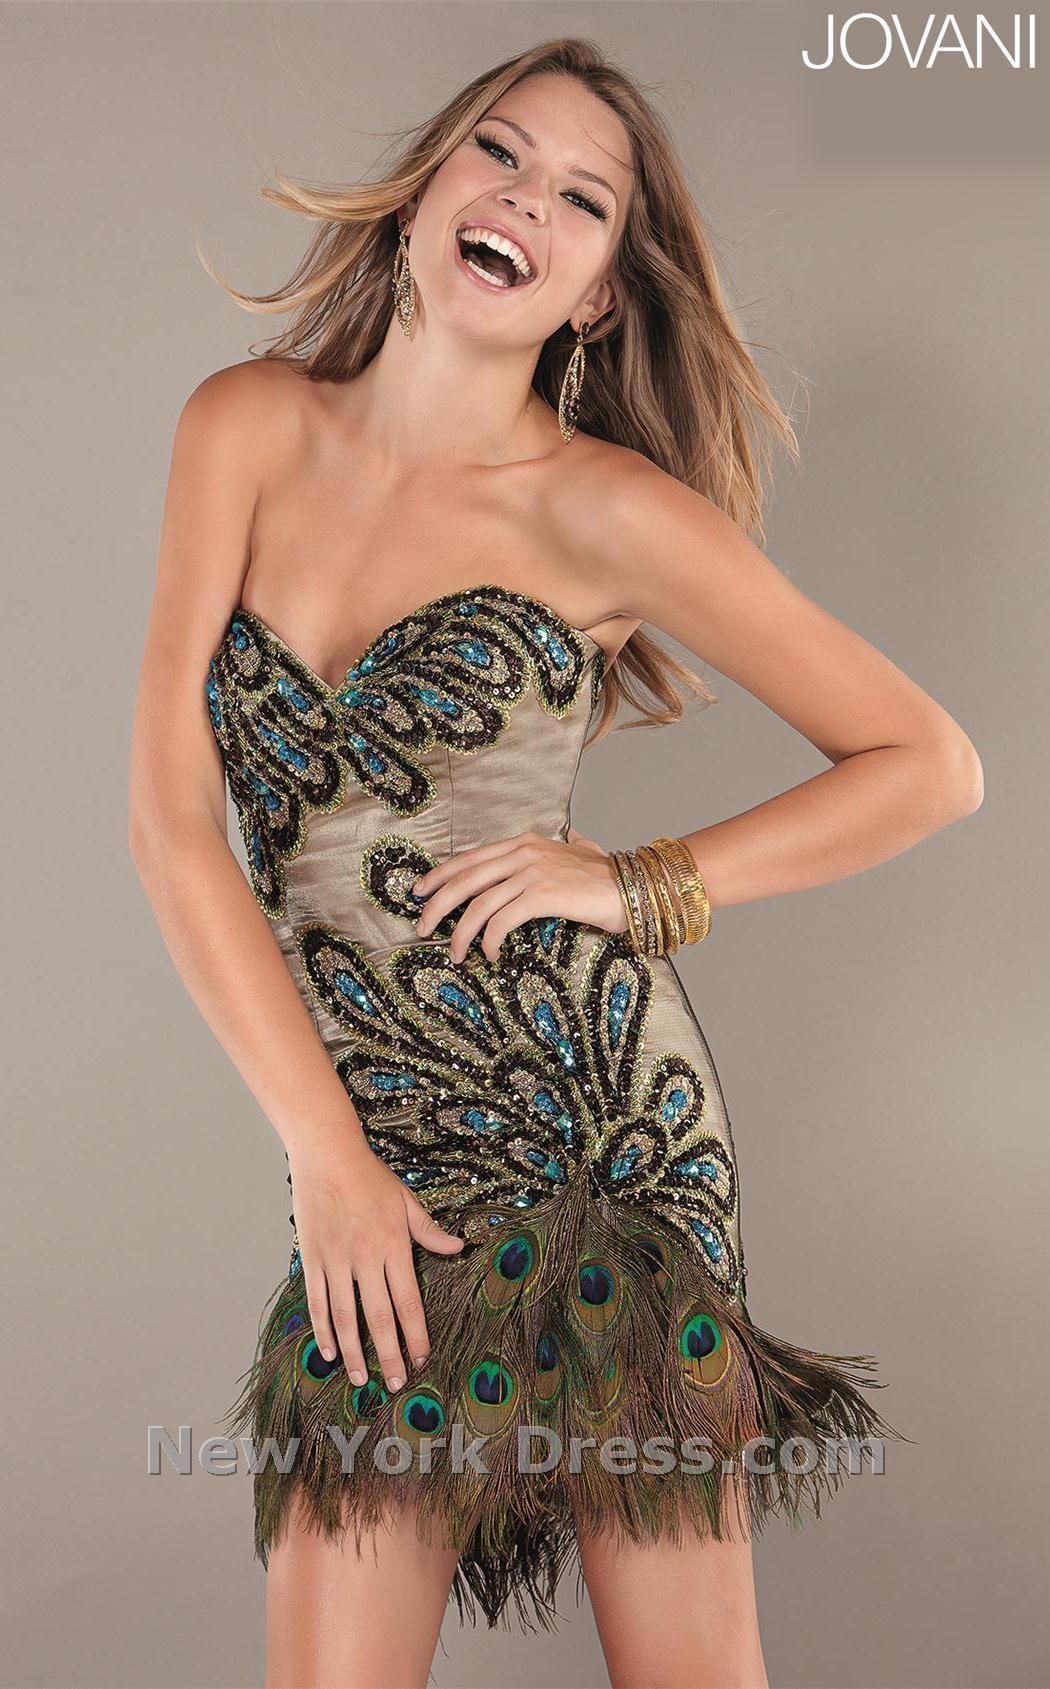 Jovani Peacock Cocktail Dress